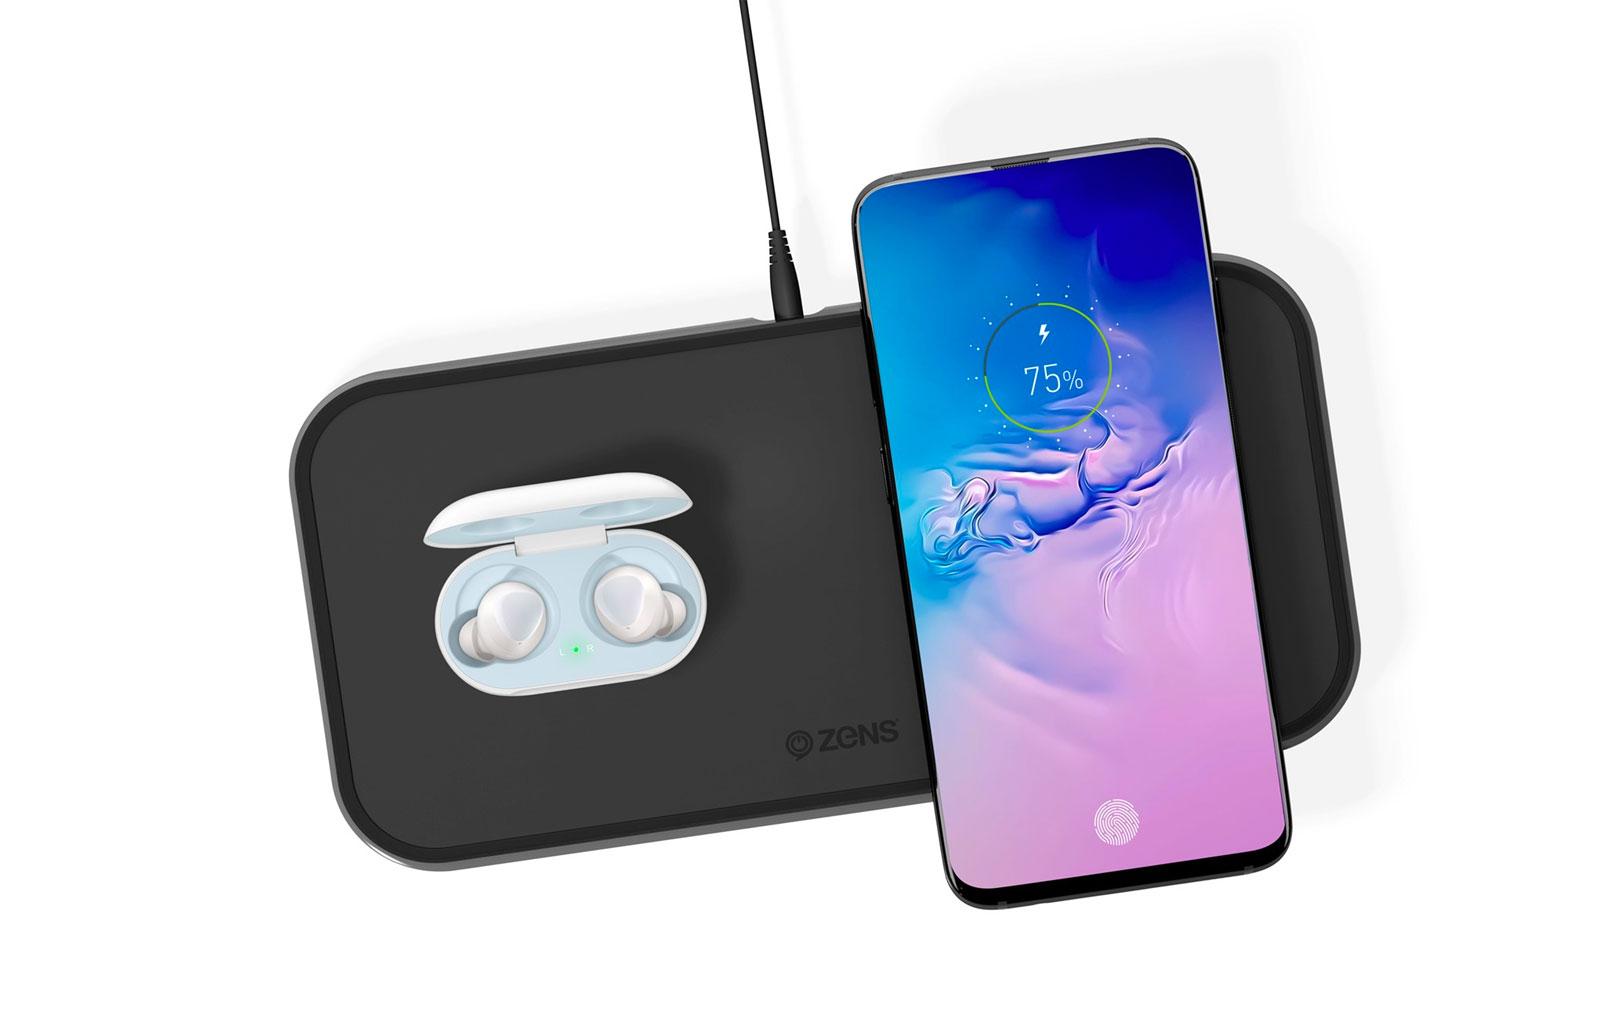 Samsung smartphone and buds